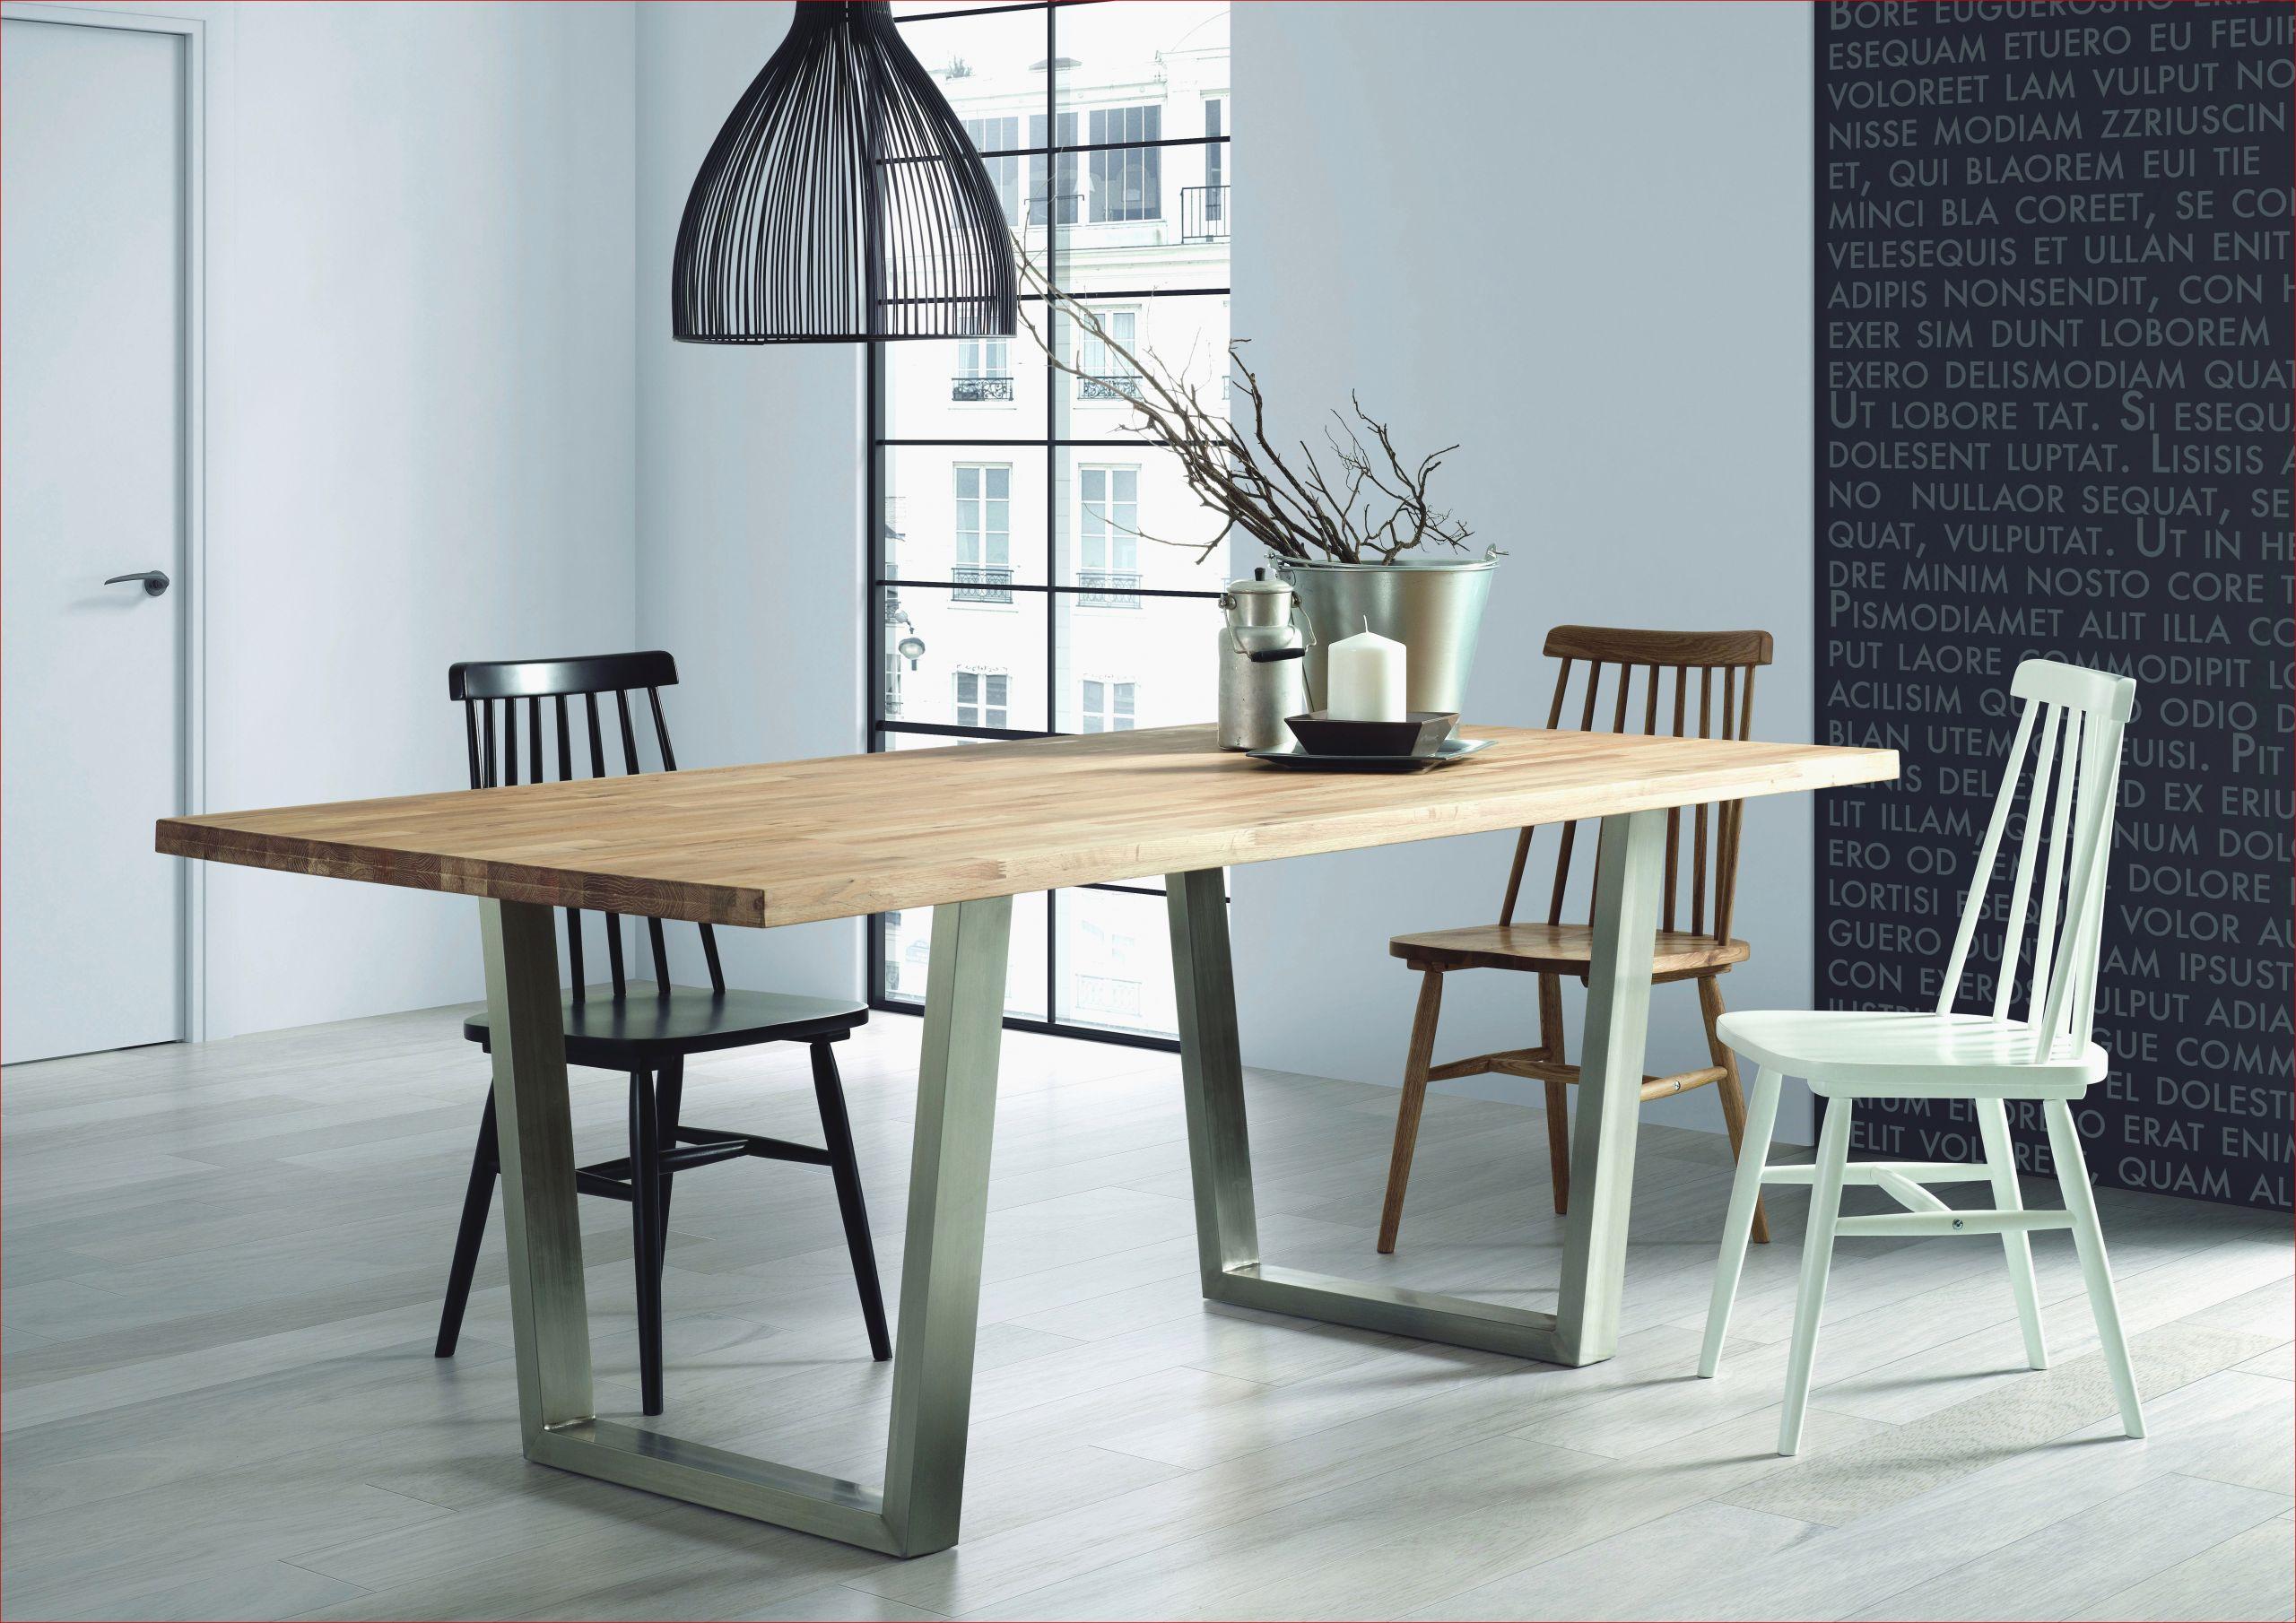 chaise fer forge salle a manger charmant salle a manger en fer forge et verre inspiration inspirant de chaise of chaise fer forge salle a manger